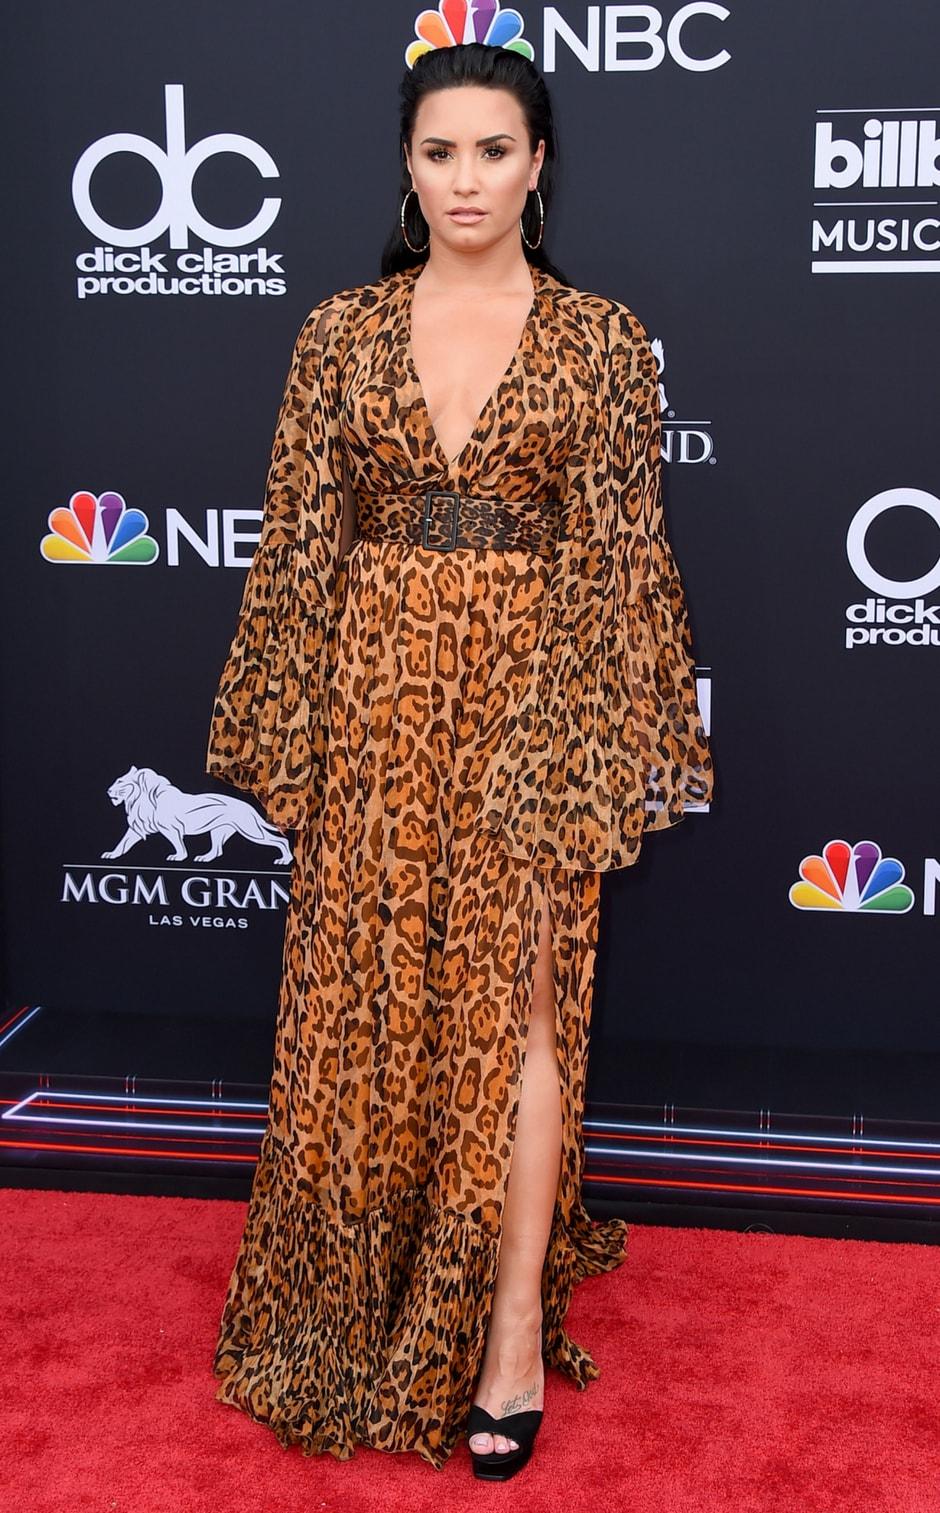 Demi Lovato at the Billboard Music Awards/Photo by Jordan Strauss/Invision/AP